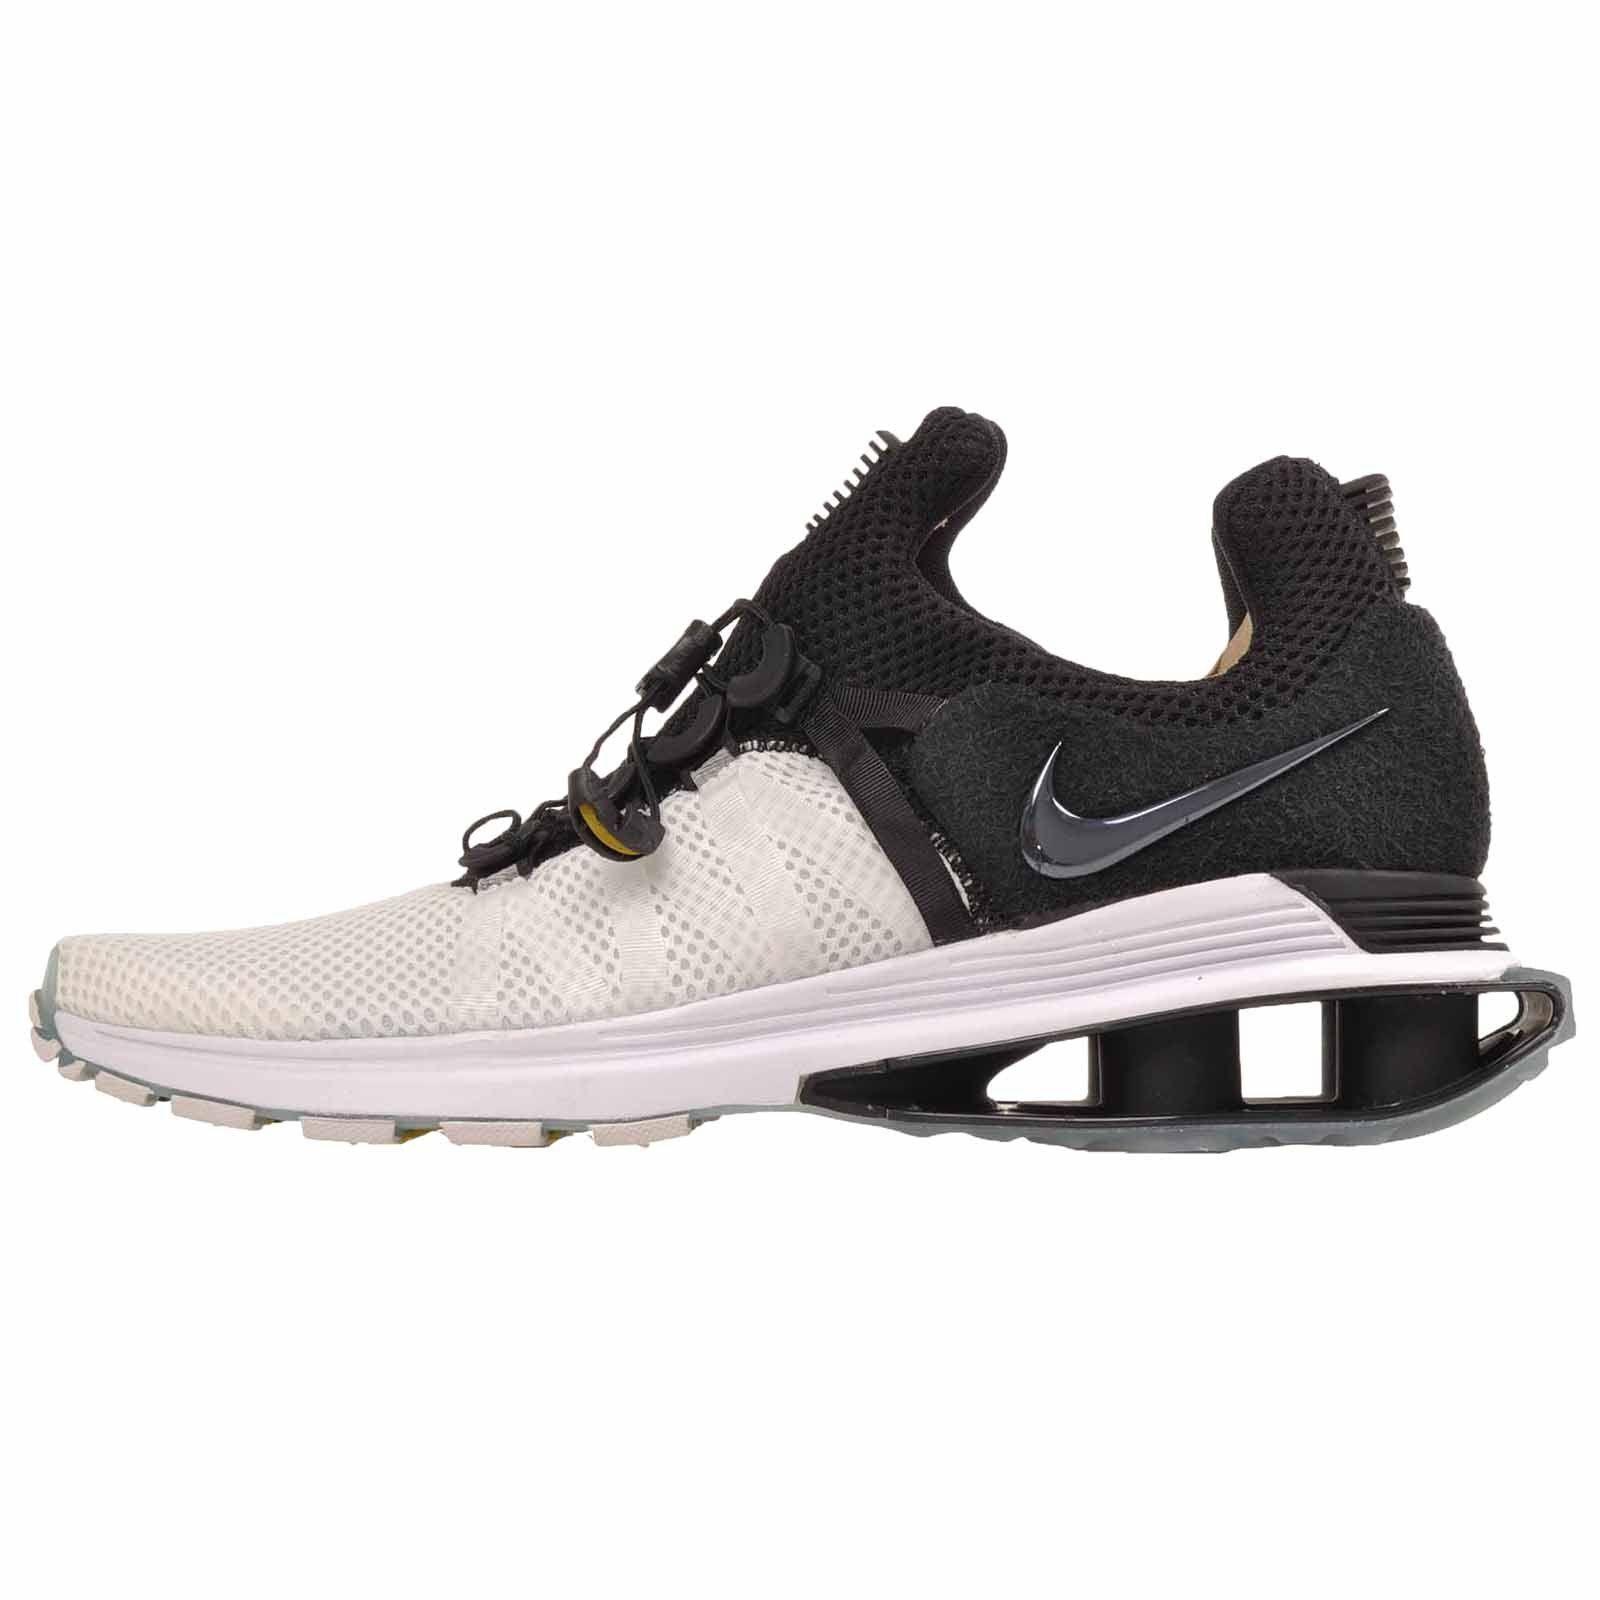 Nike Shox Gravity Running Mens shoes White Black AR1999-101